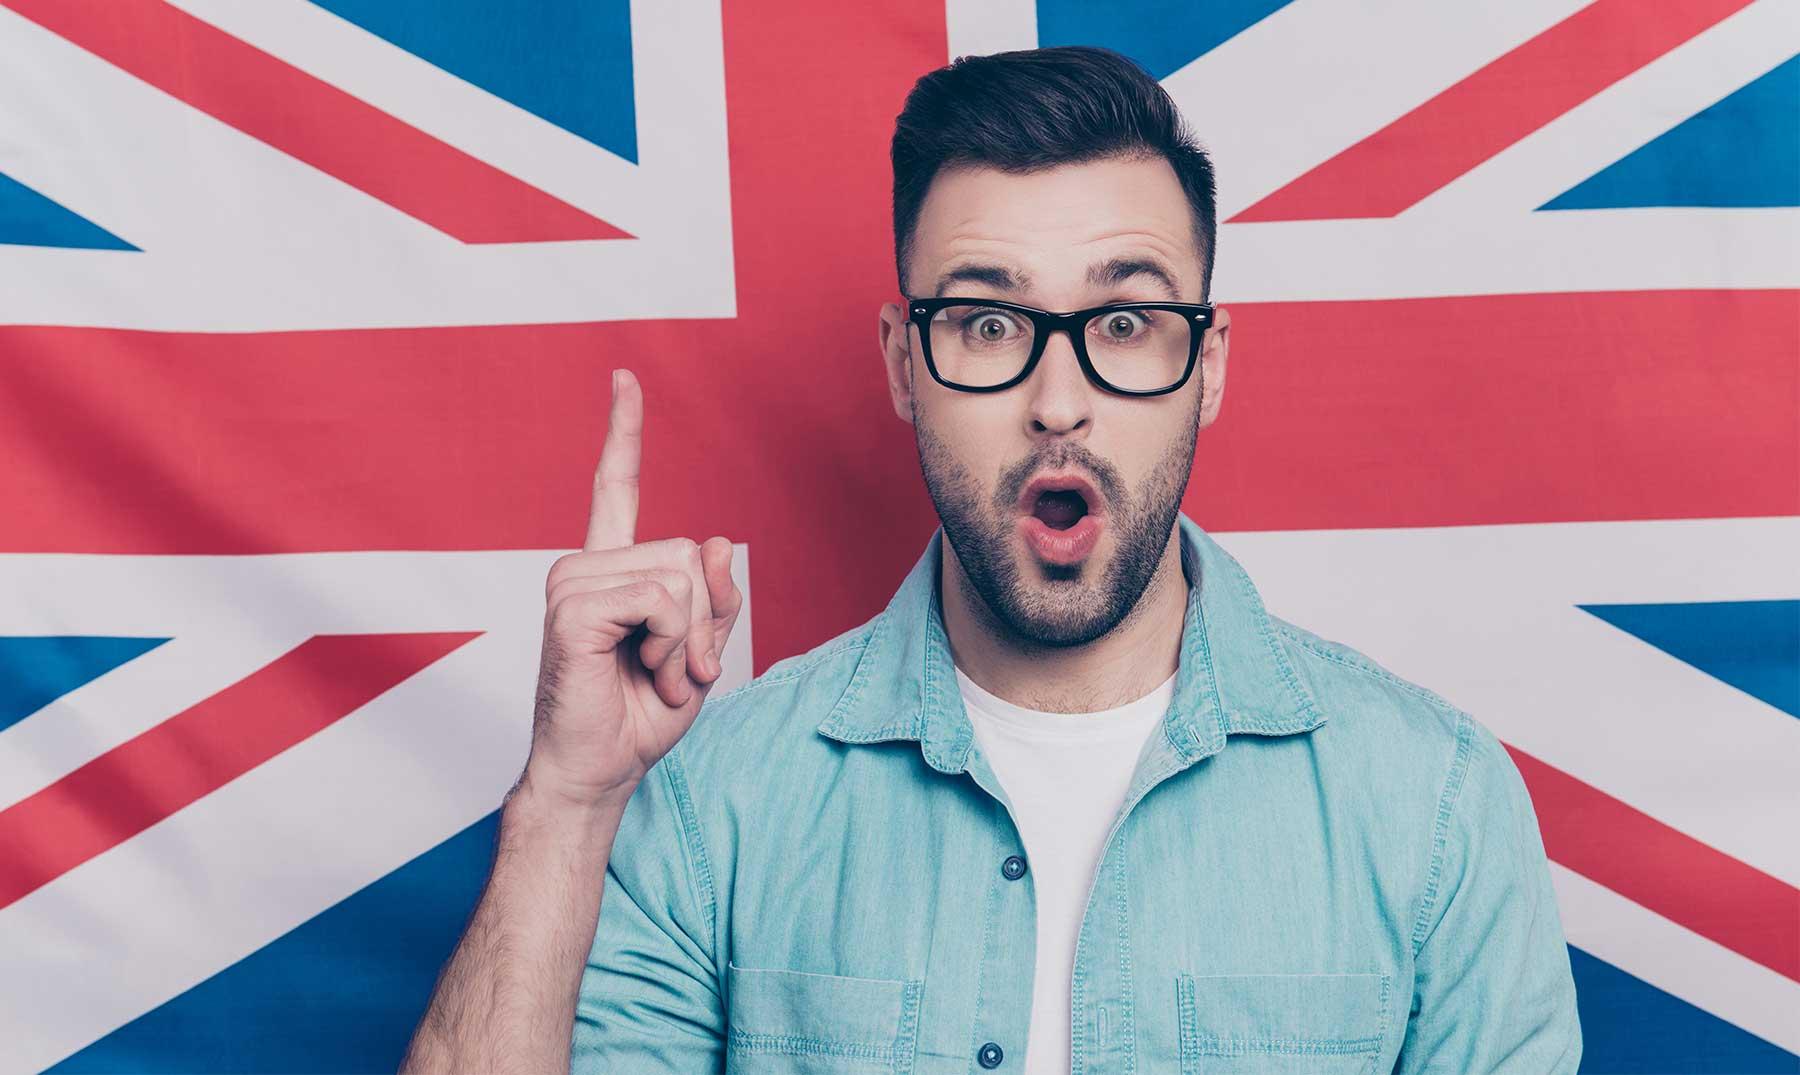 saber-ingles-para-trabajar-en-el-extranjero